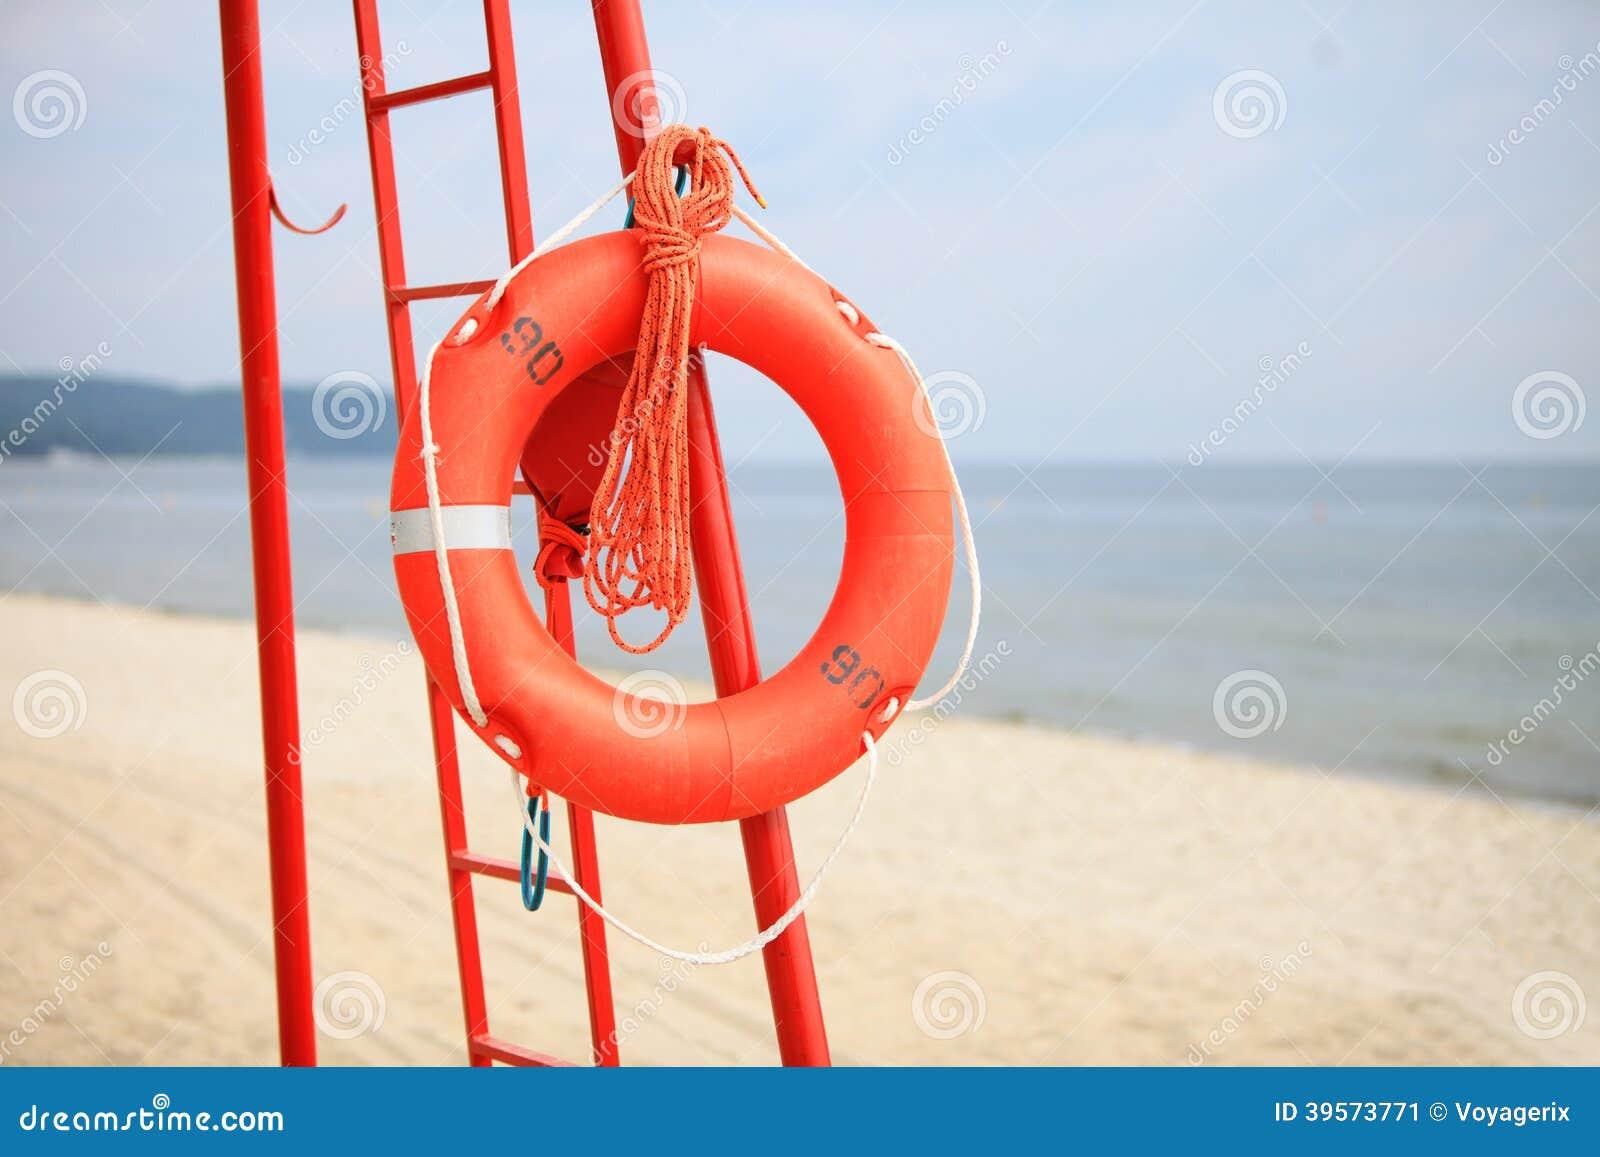 asian singles in orange beach Orange park's best 100% free asian online dating site meet cute asian singles in florida with our free orange park asian dating new symrna beach asian dating.